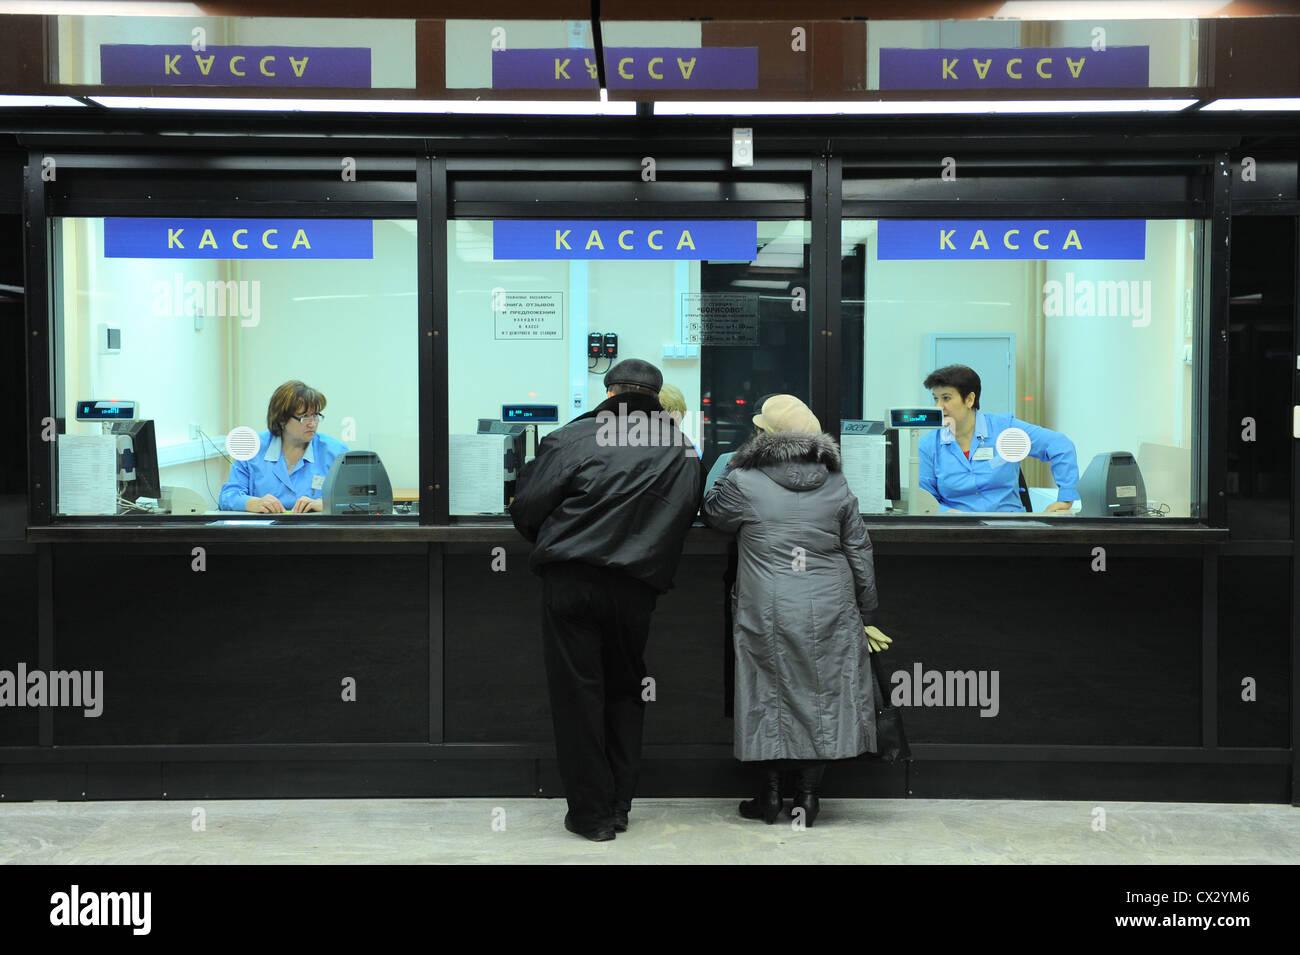 MOSCOW, RUSSIA. DECEMBER 2, 2011. Ticket booths at the newly opened Borisovo station. (Photo ITAR-TASS / Mitya Aleshkovsky) - Stock Image